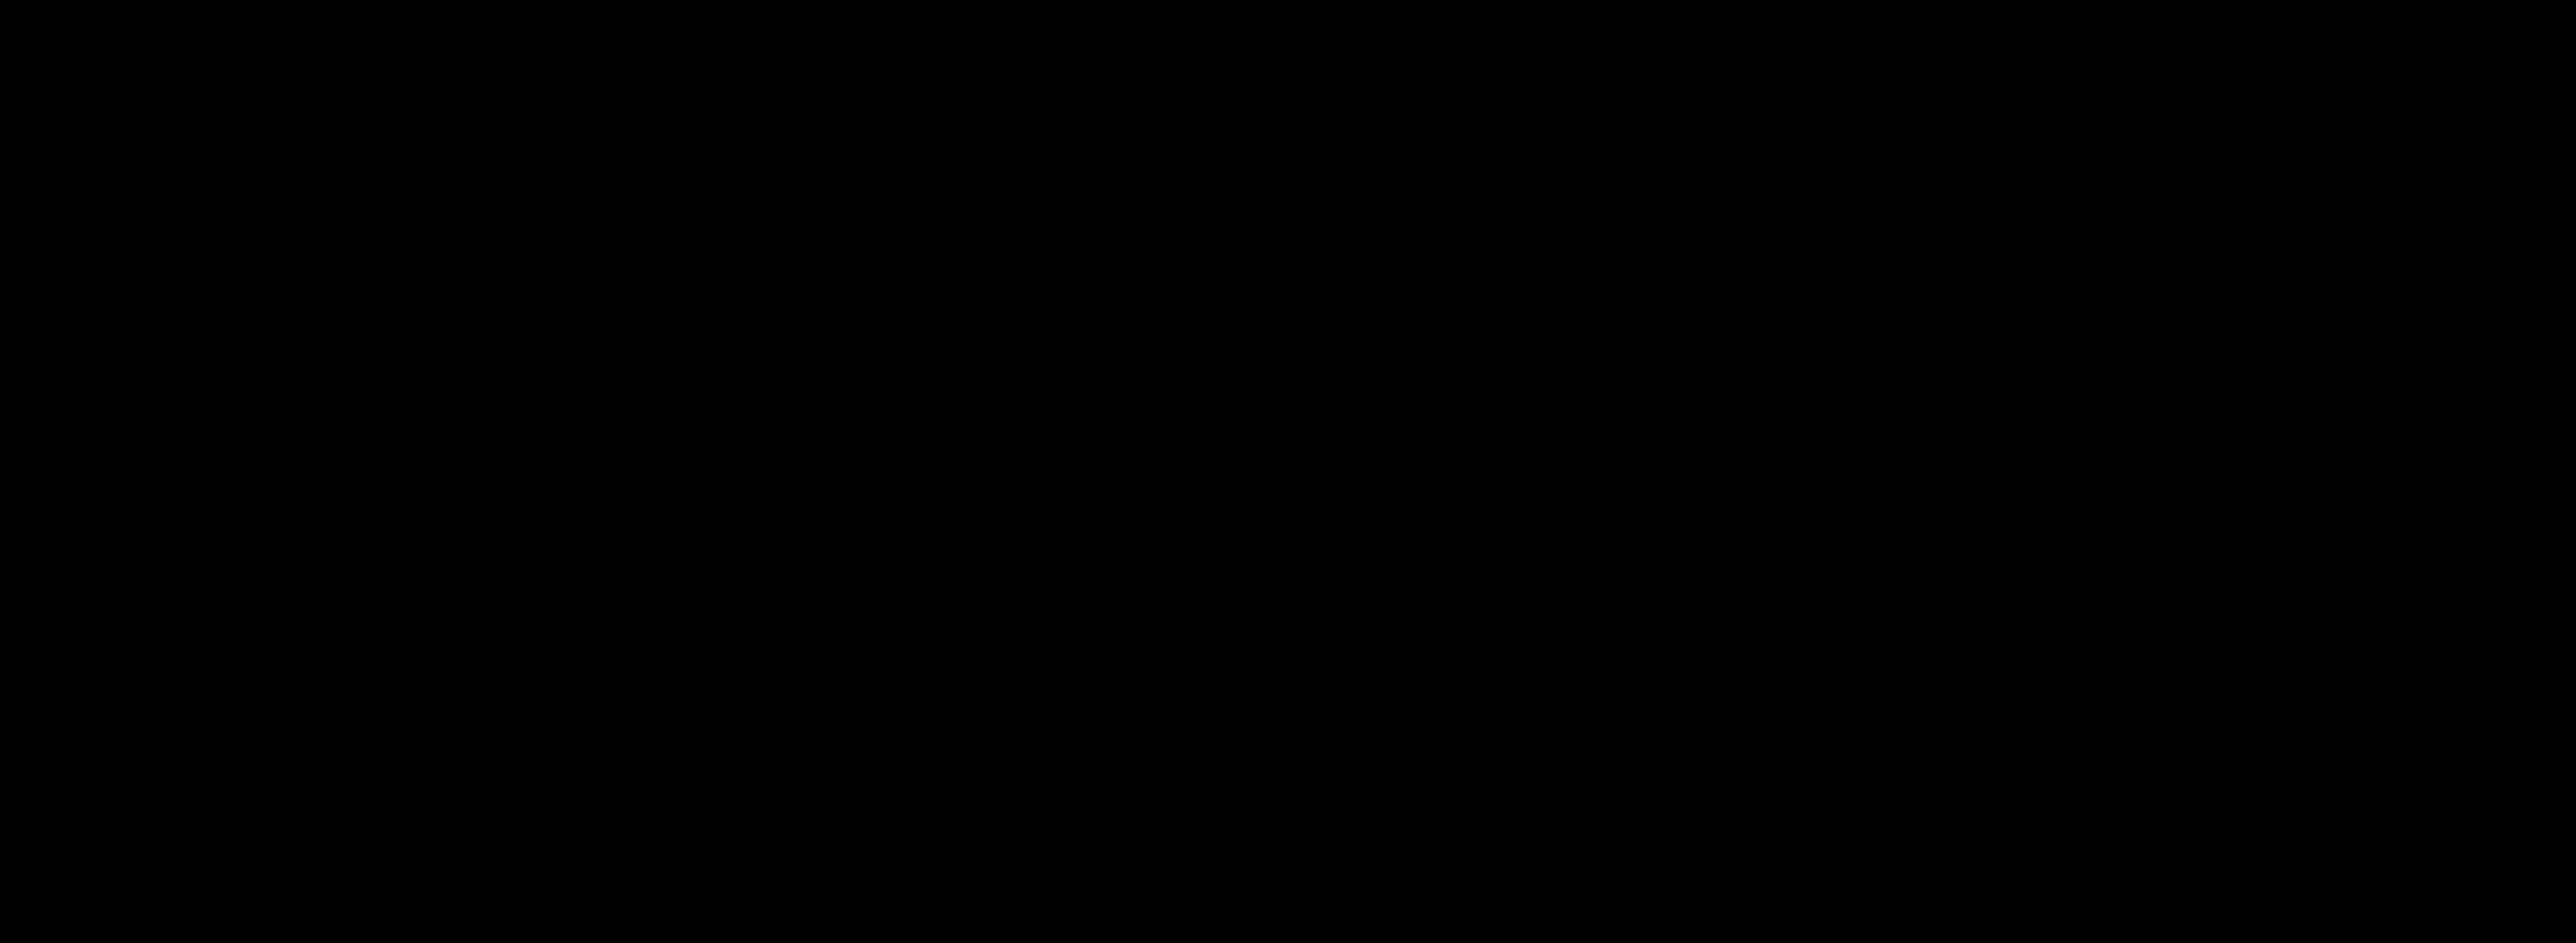 Juleah Kaliski Designs Logo